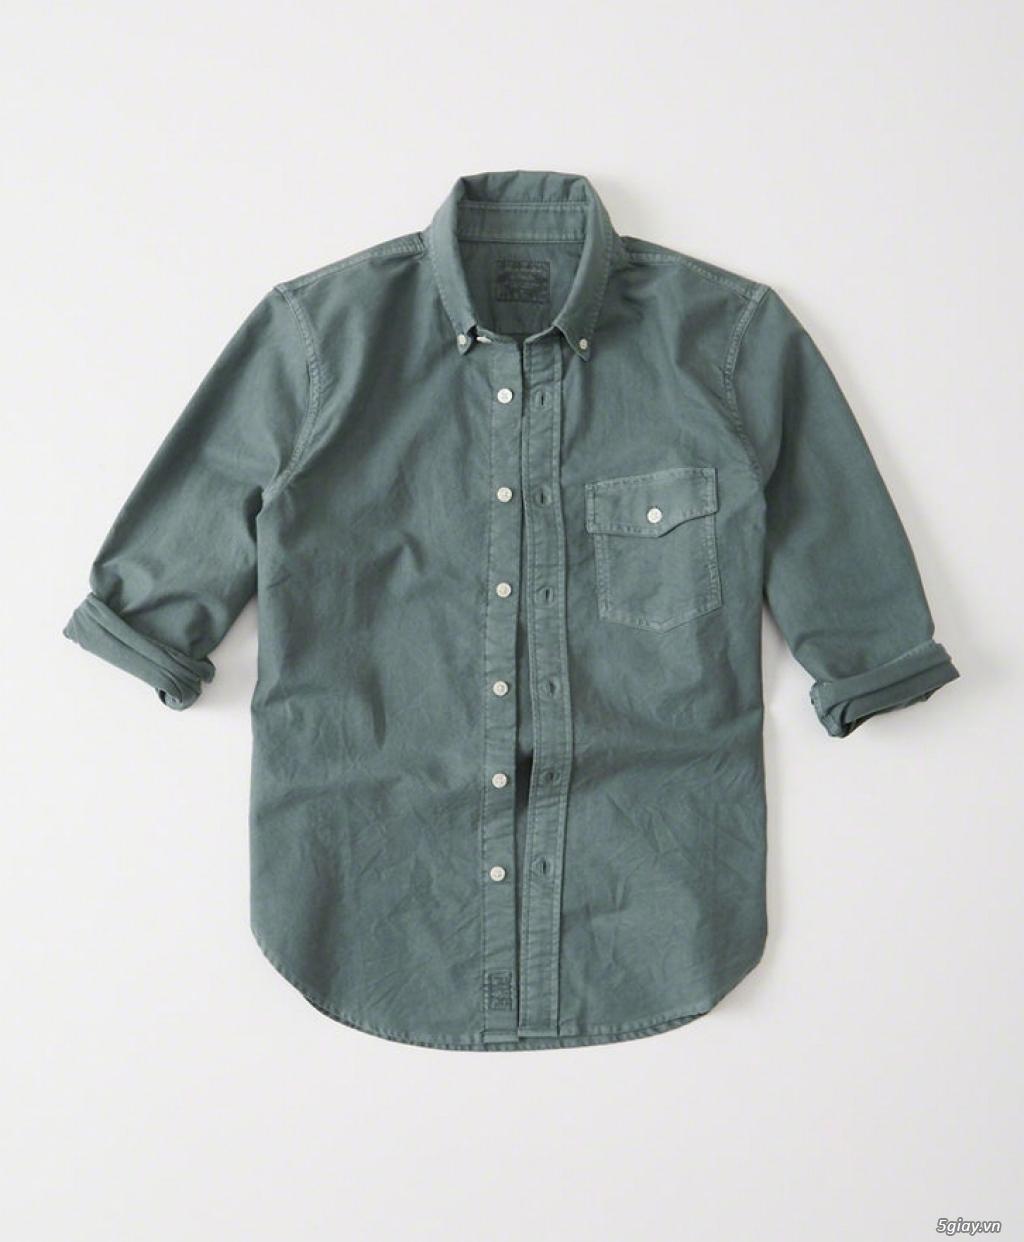 [ Lamanshop.com ]- Quần áo HOLLISTER - ABERCROMBIE & FITCH - Chính hãng USA 100% - 10